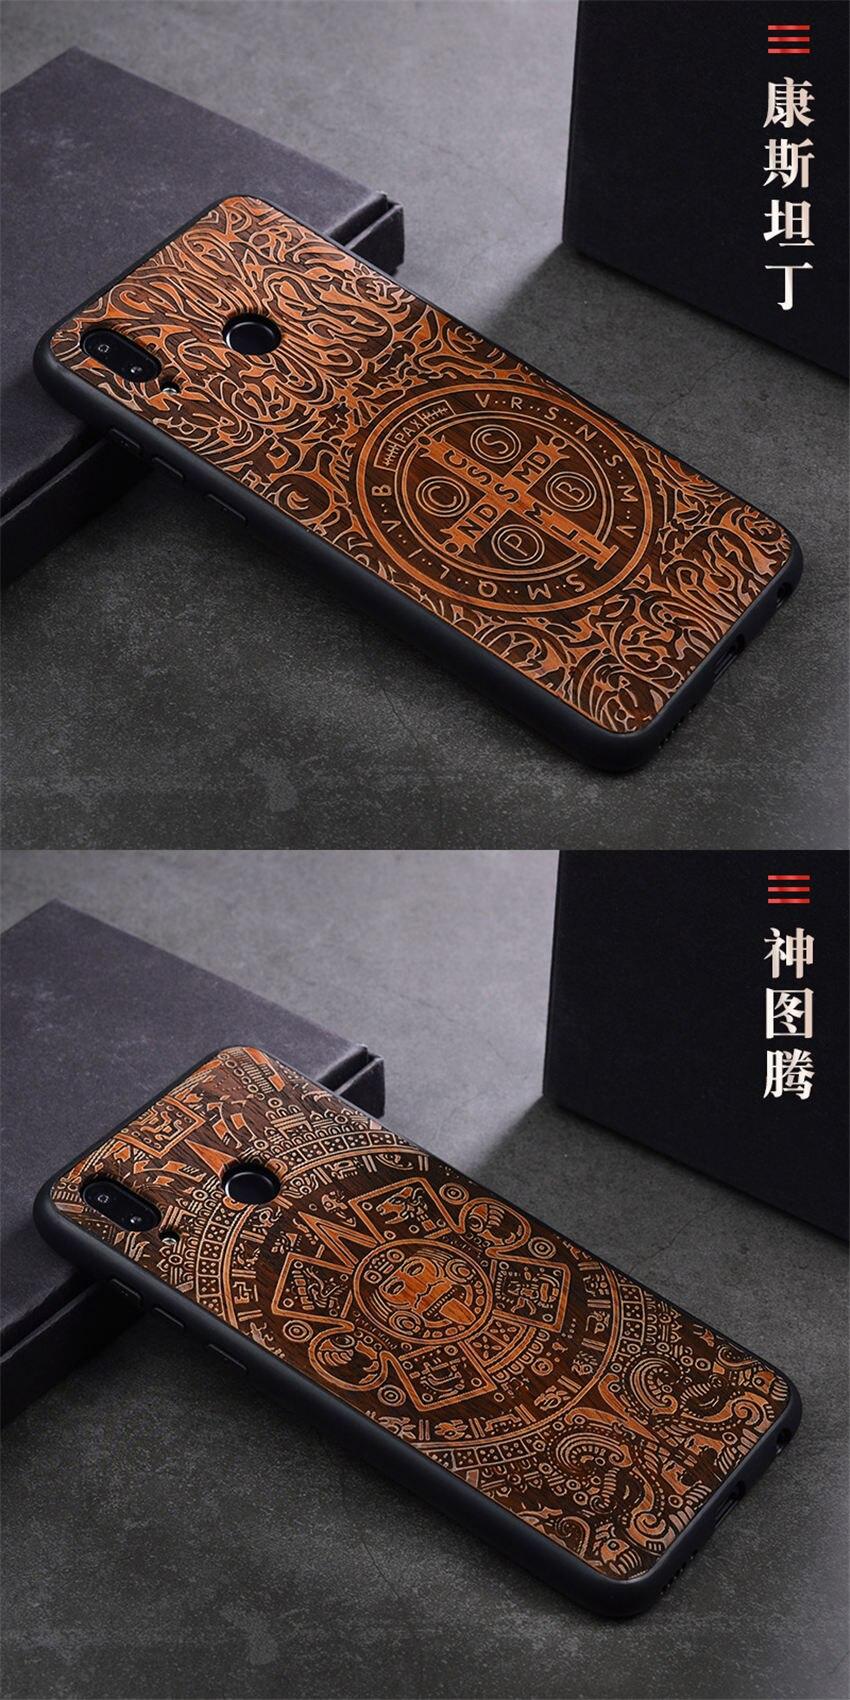 2018 New Huawei Honor 8x Case Slim Wood Back Cover TPU Bumper Case For Huawei Honor 8x Phone Cases Honor-8x (10)